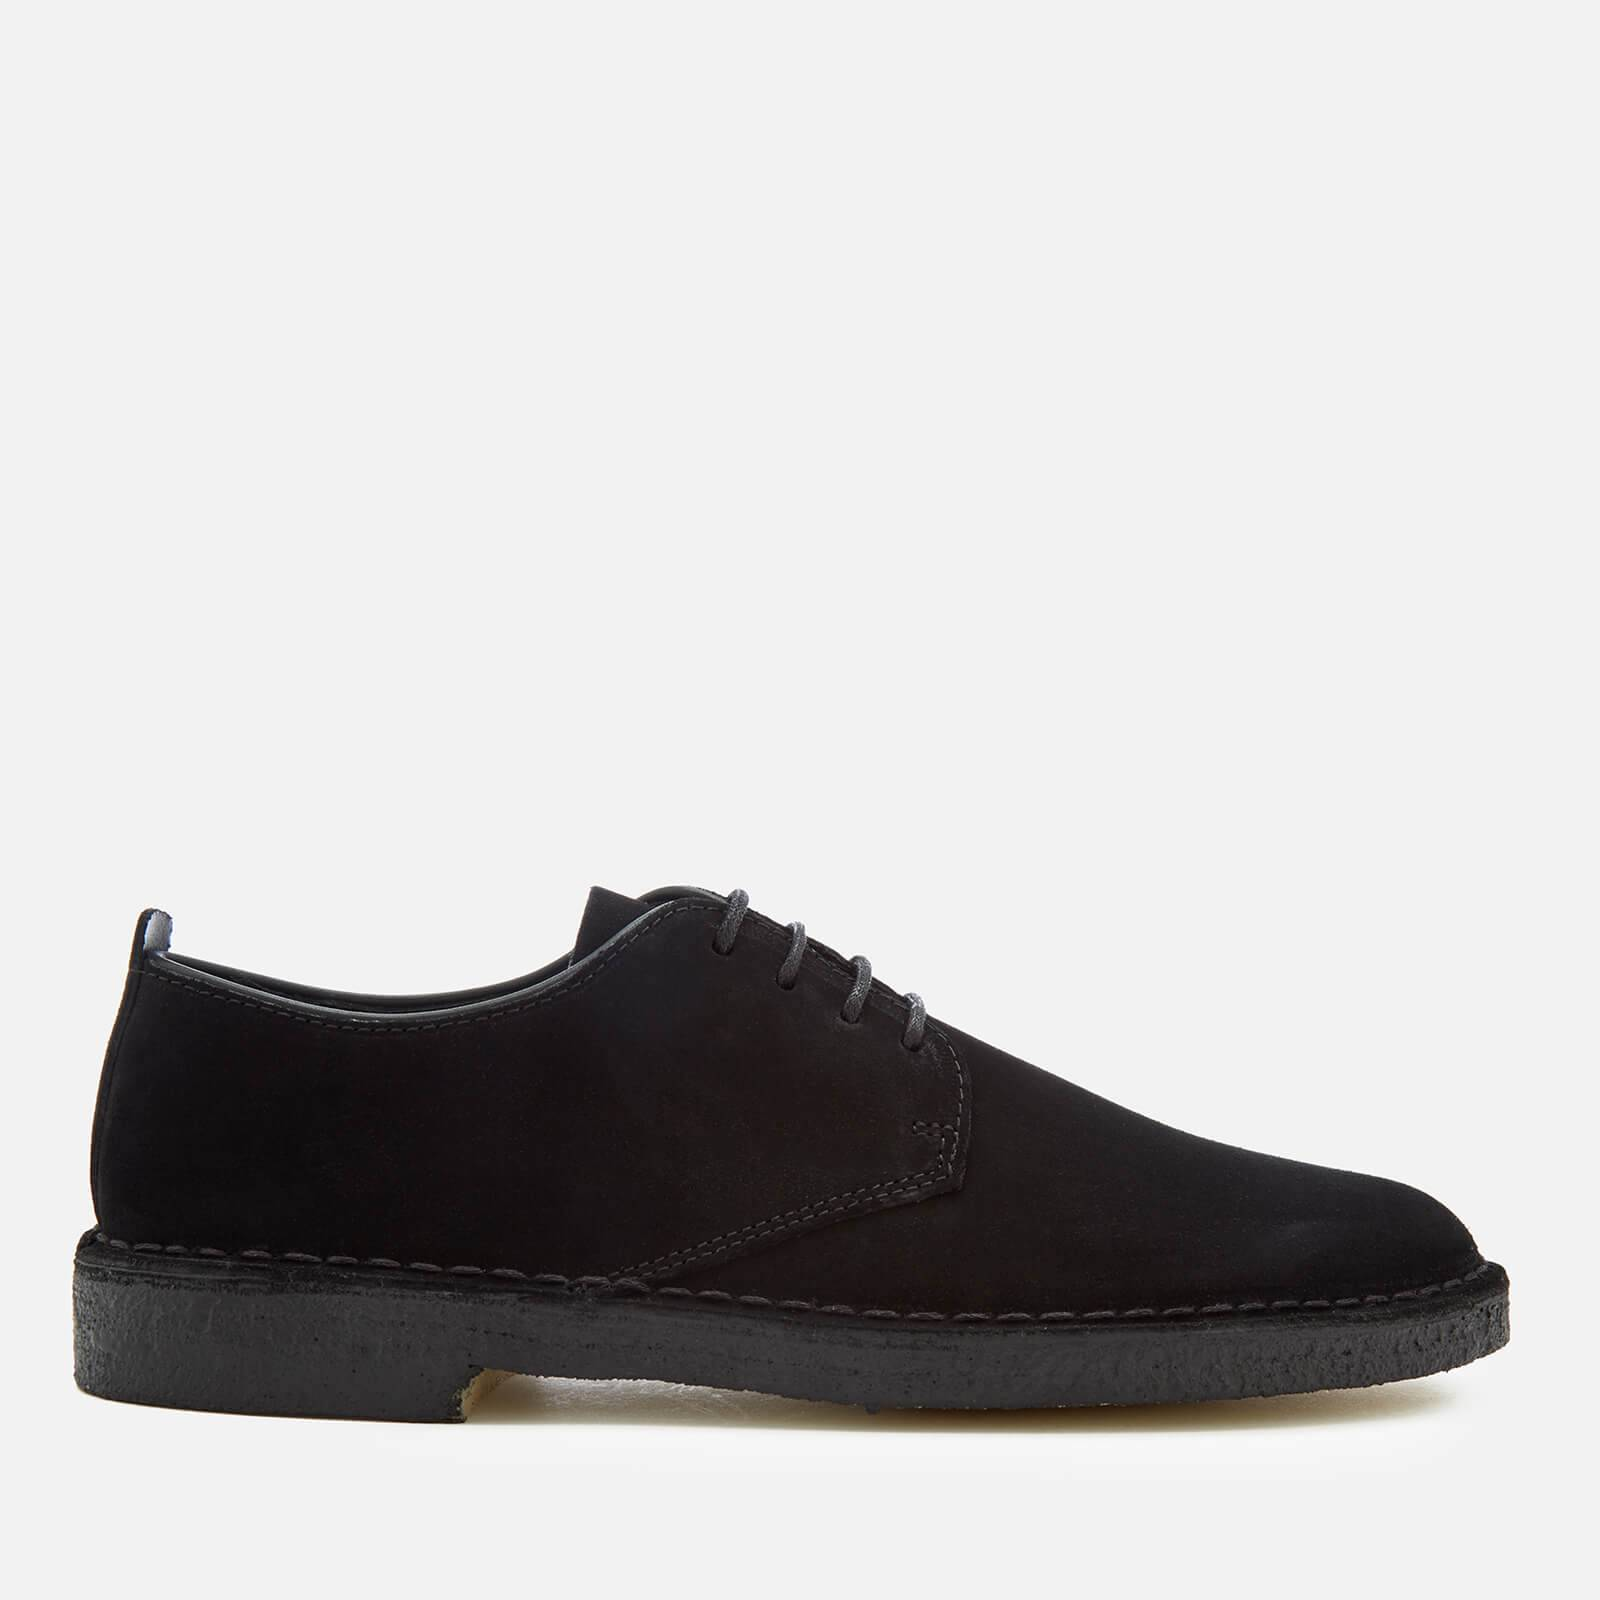 Clarks Originals Men's Desert London Shoes - Black - UK 9 - Black